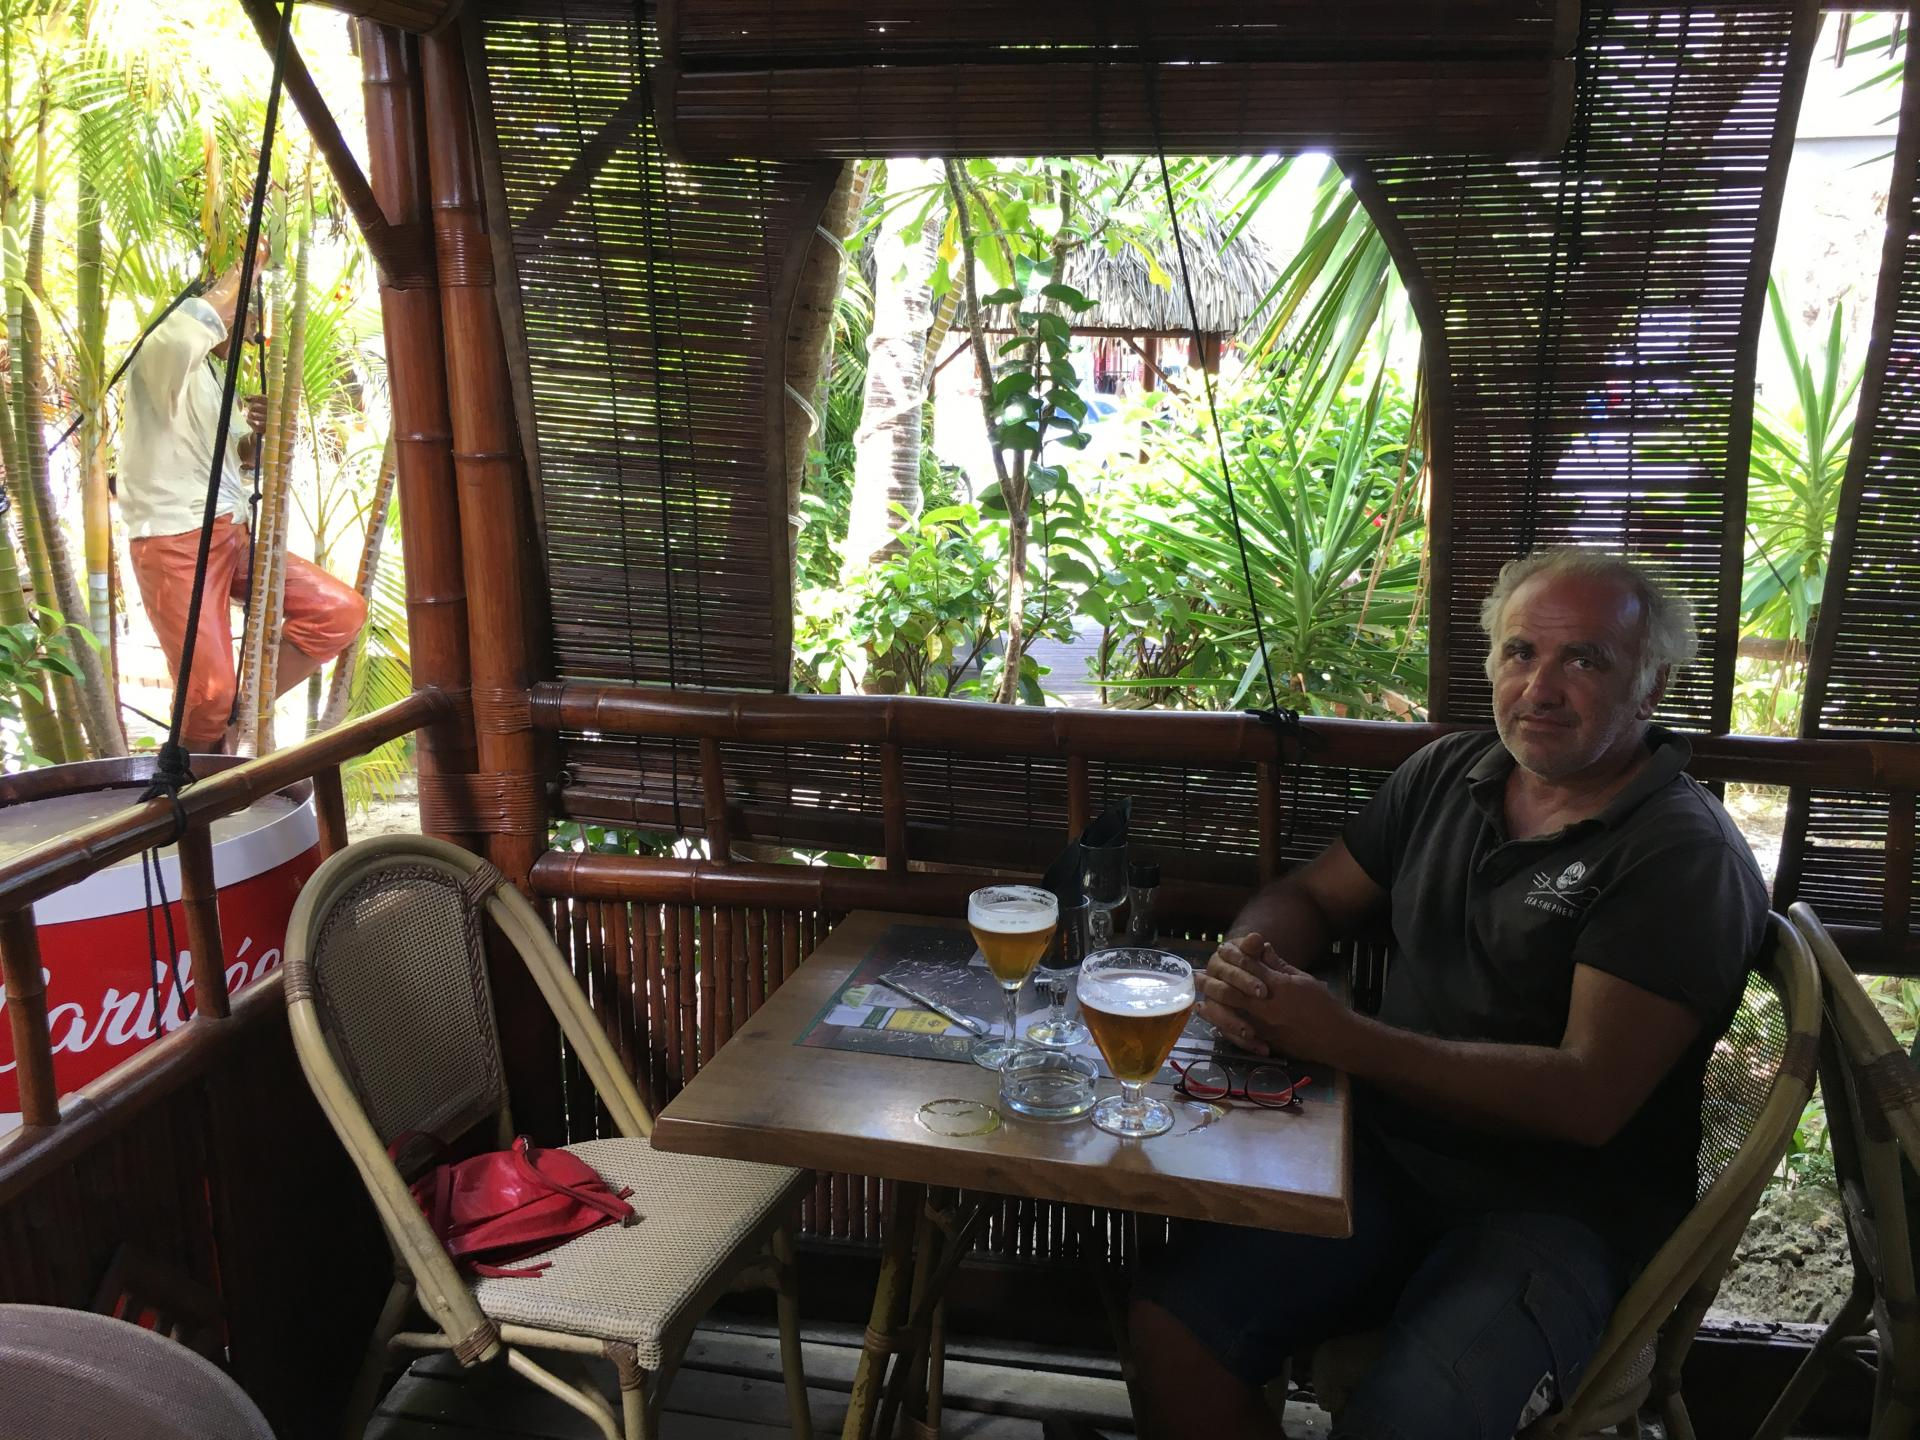 Restaurant Pirates des Caraïbes